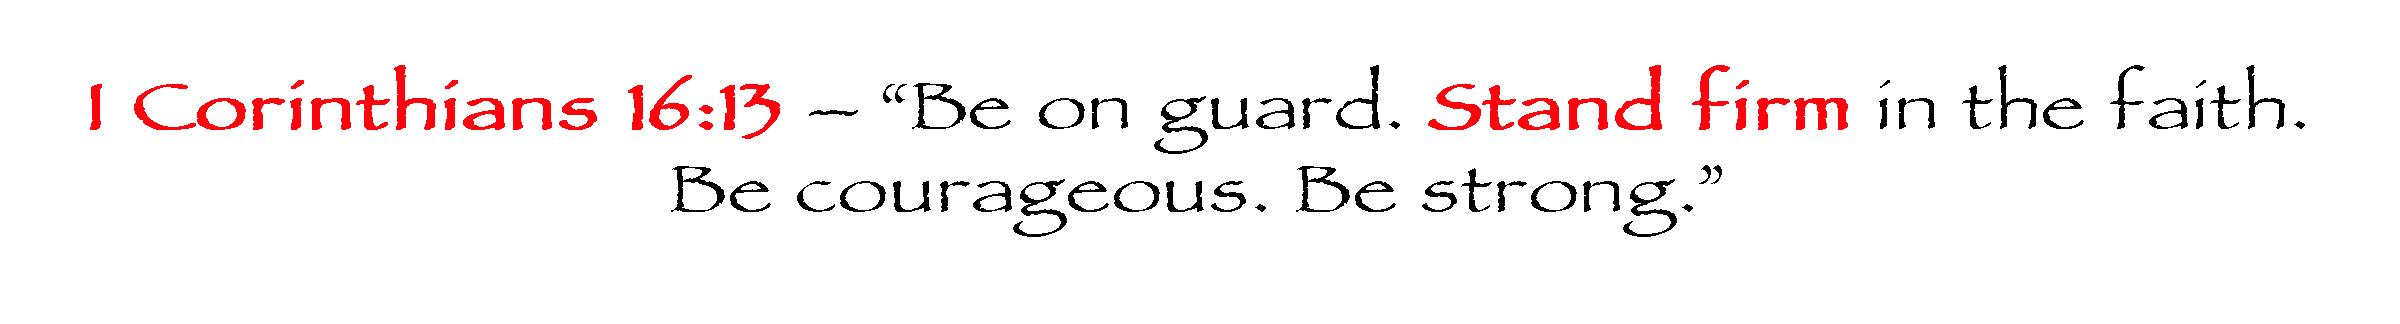 I Corinthians 16:13